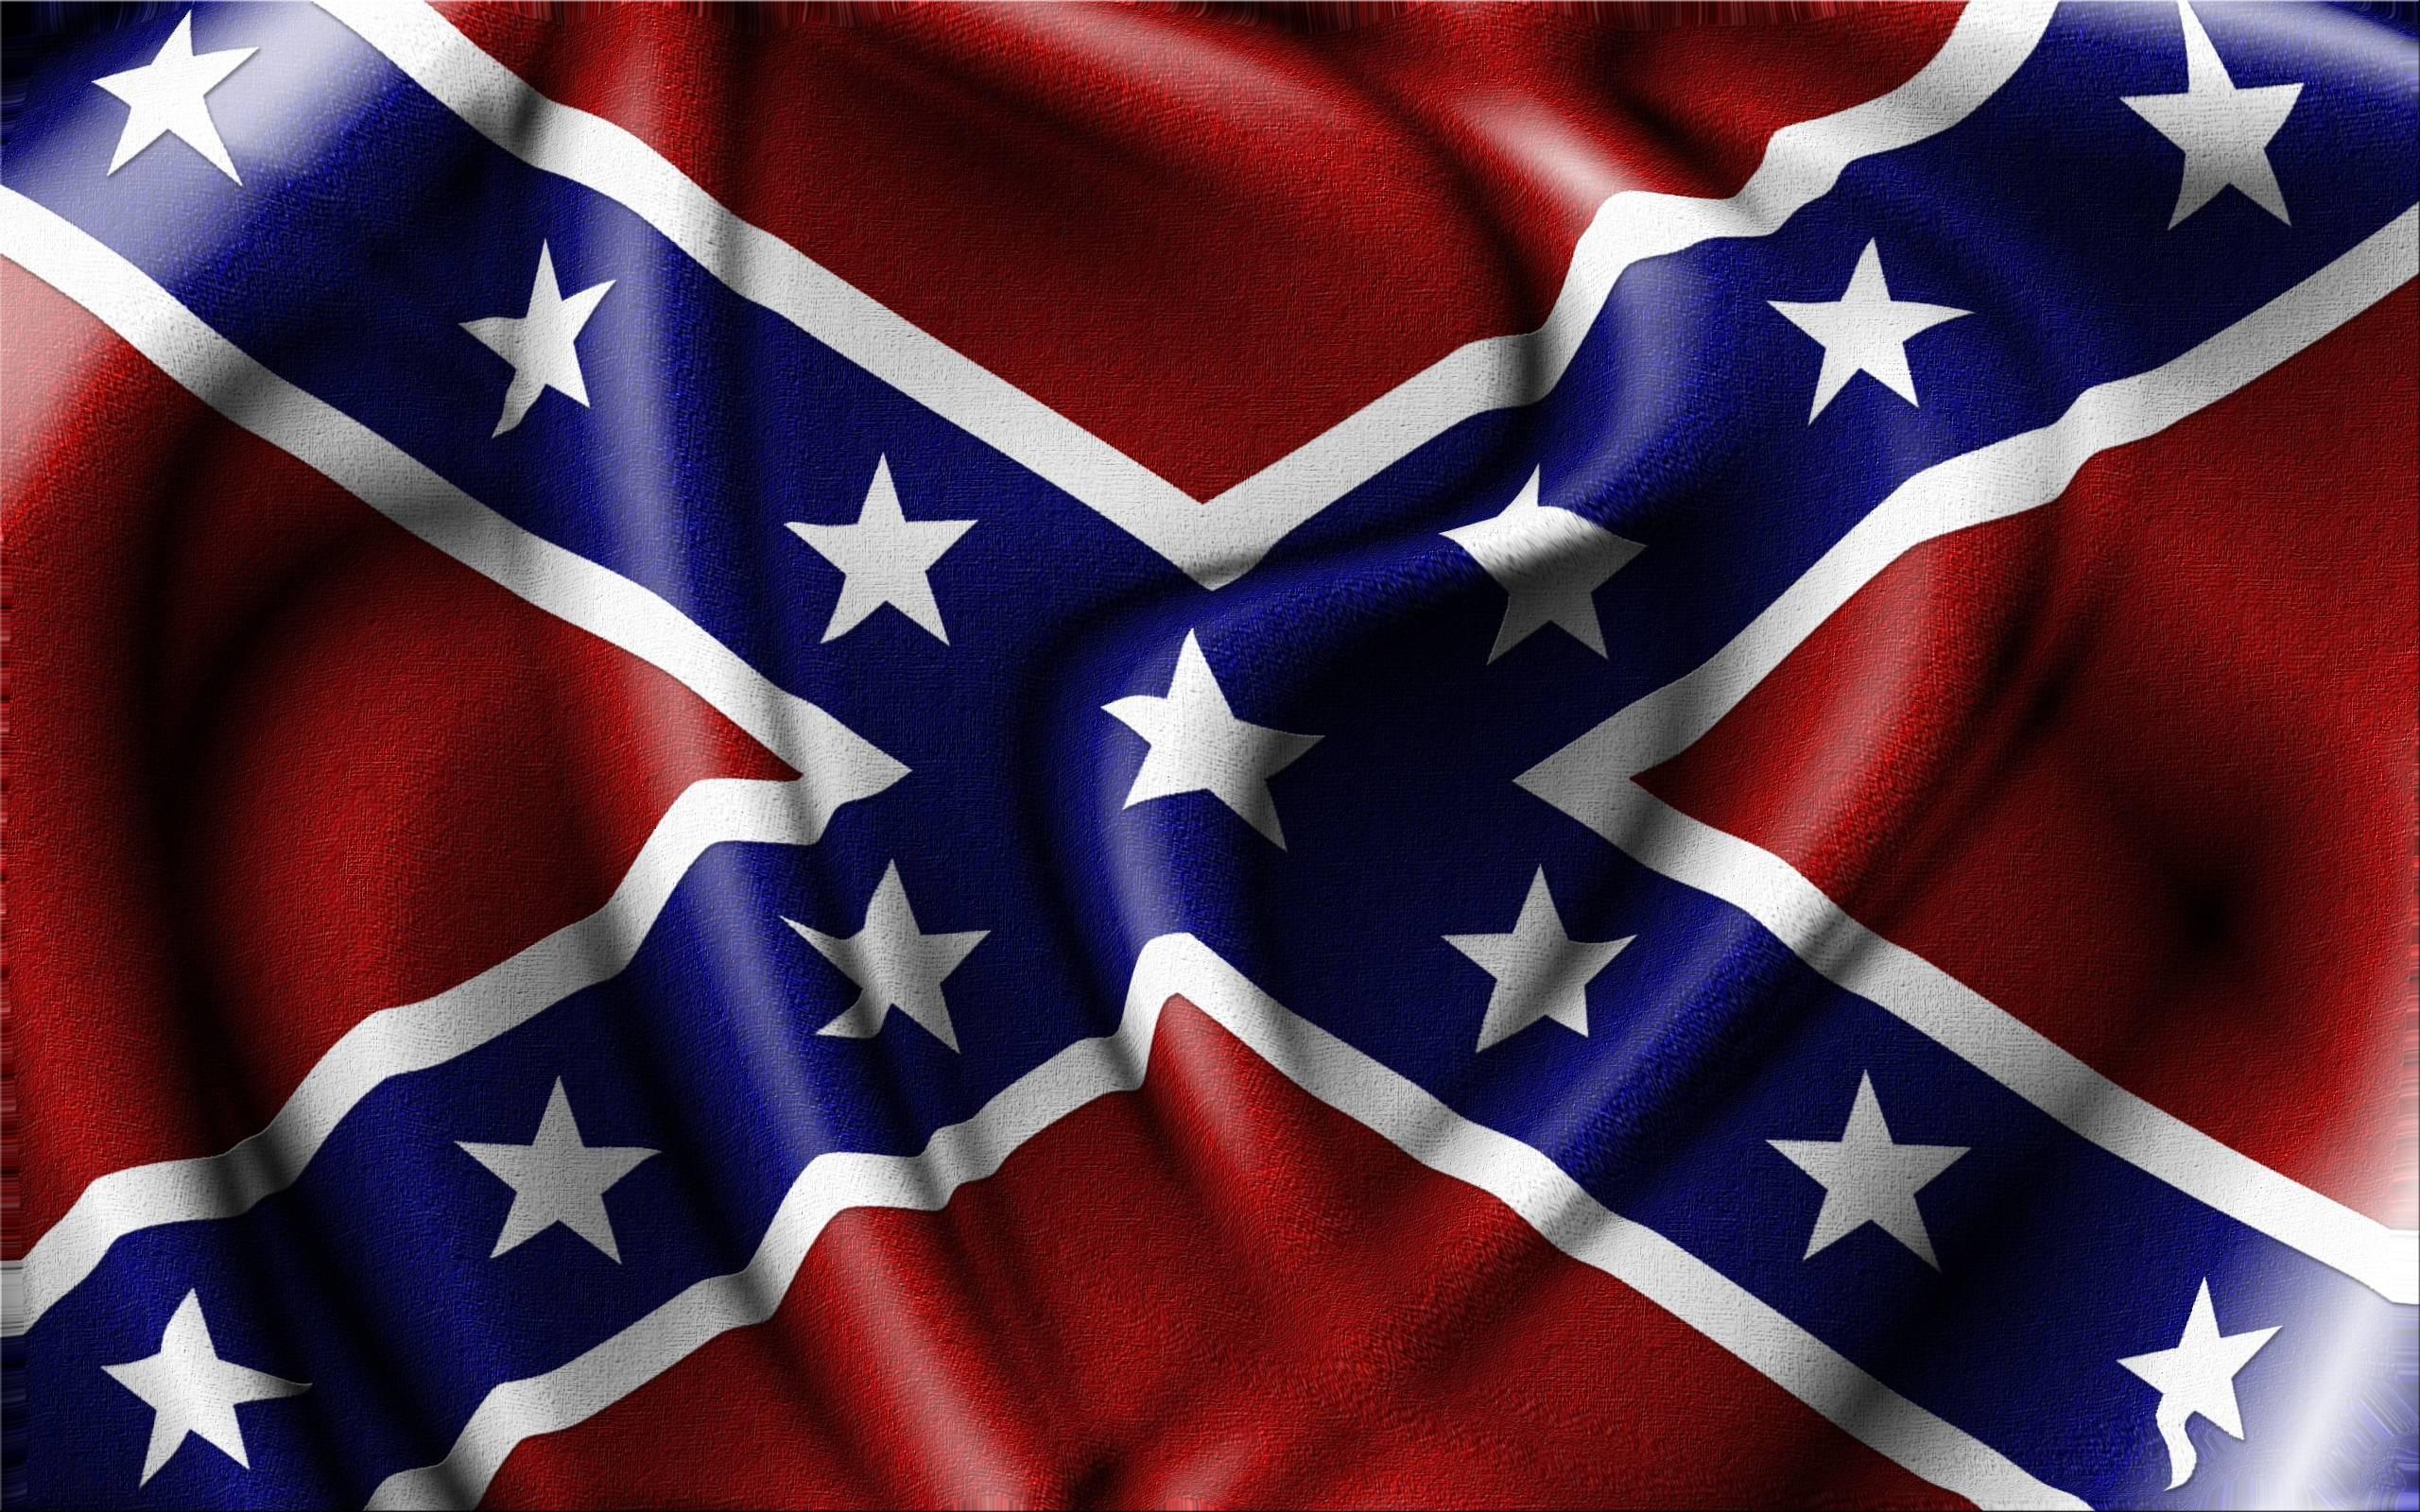 Confederate Flag Wallpaper  U00b7 U2460 Download Free Awesome Hd